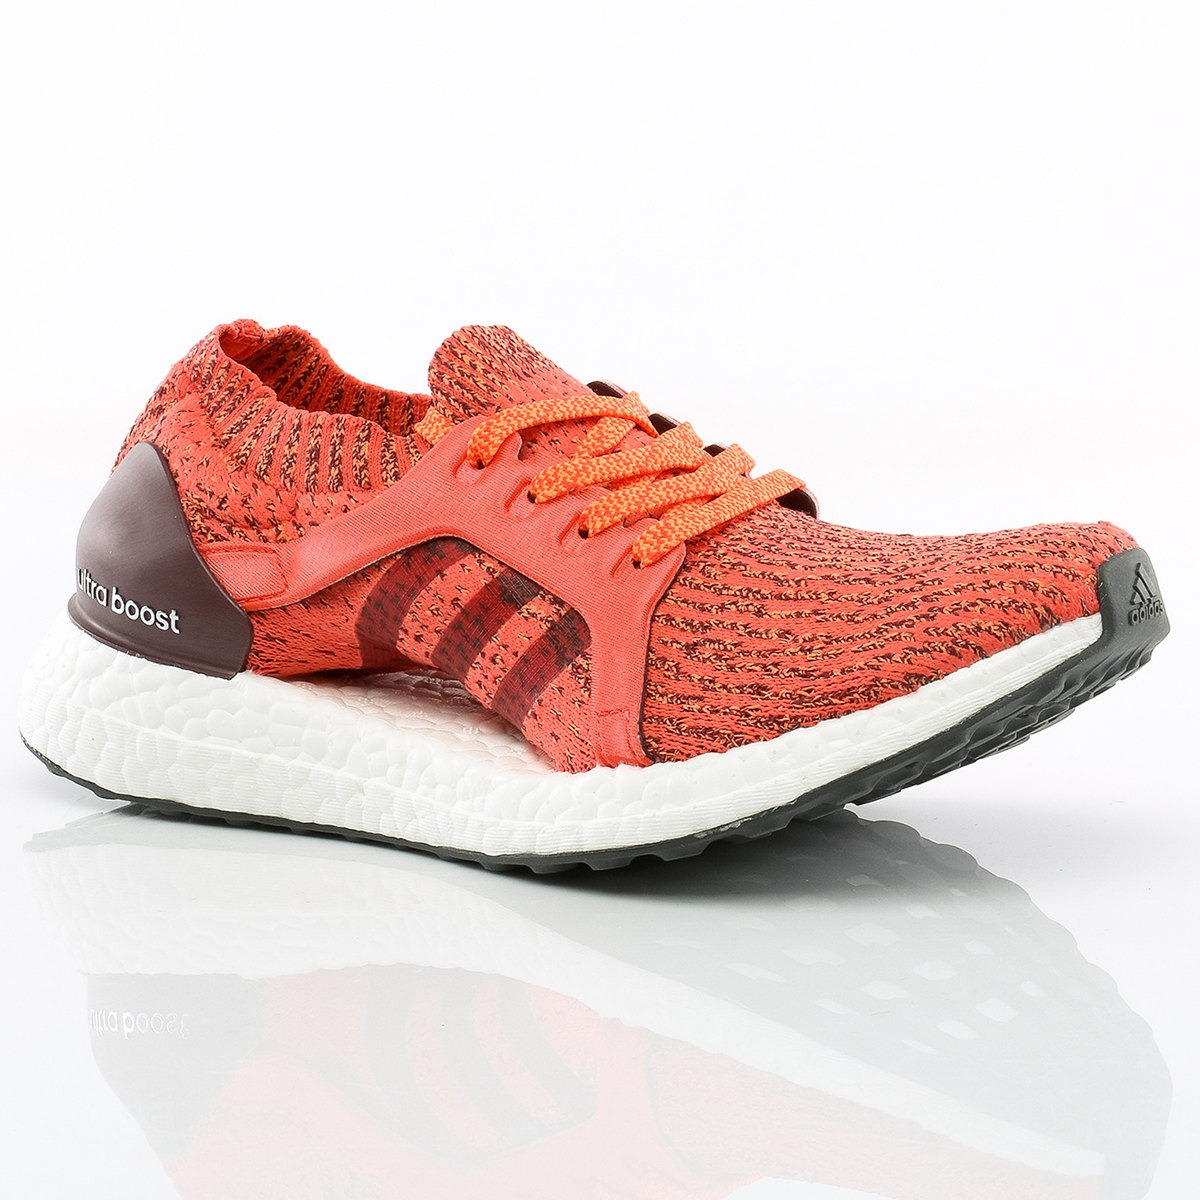 new arrival d3e59 18ca0 zapatillas ultraboost x easy coral adidas sport 78. Cargando zoom.